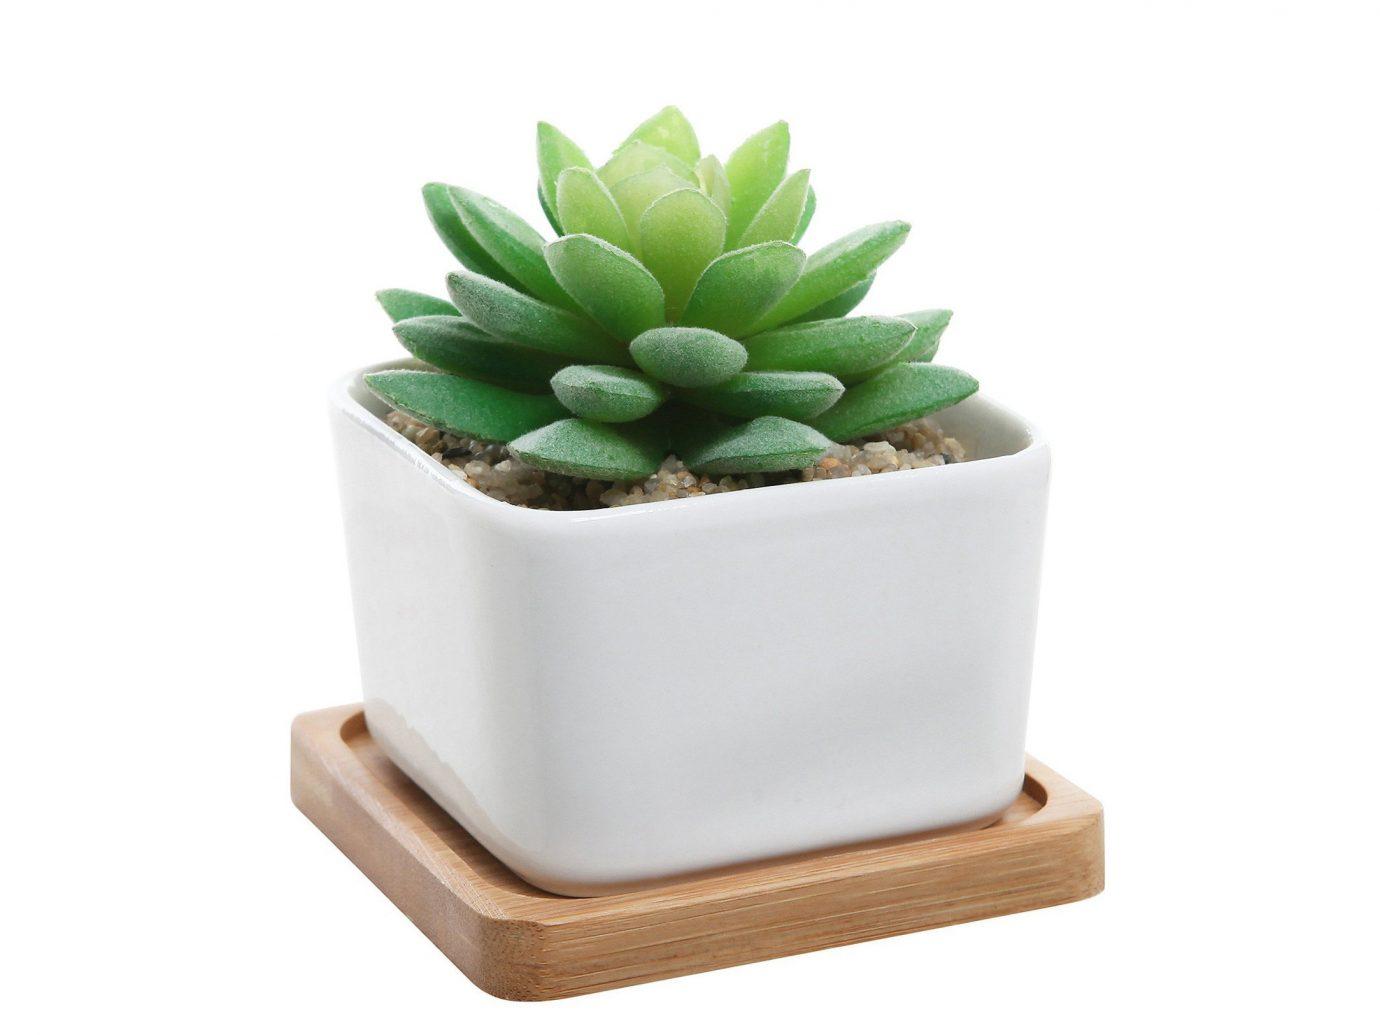 Style + Design plant land plant green flowering plant flowerpot cactus flower square vegetable